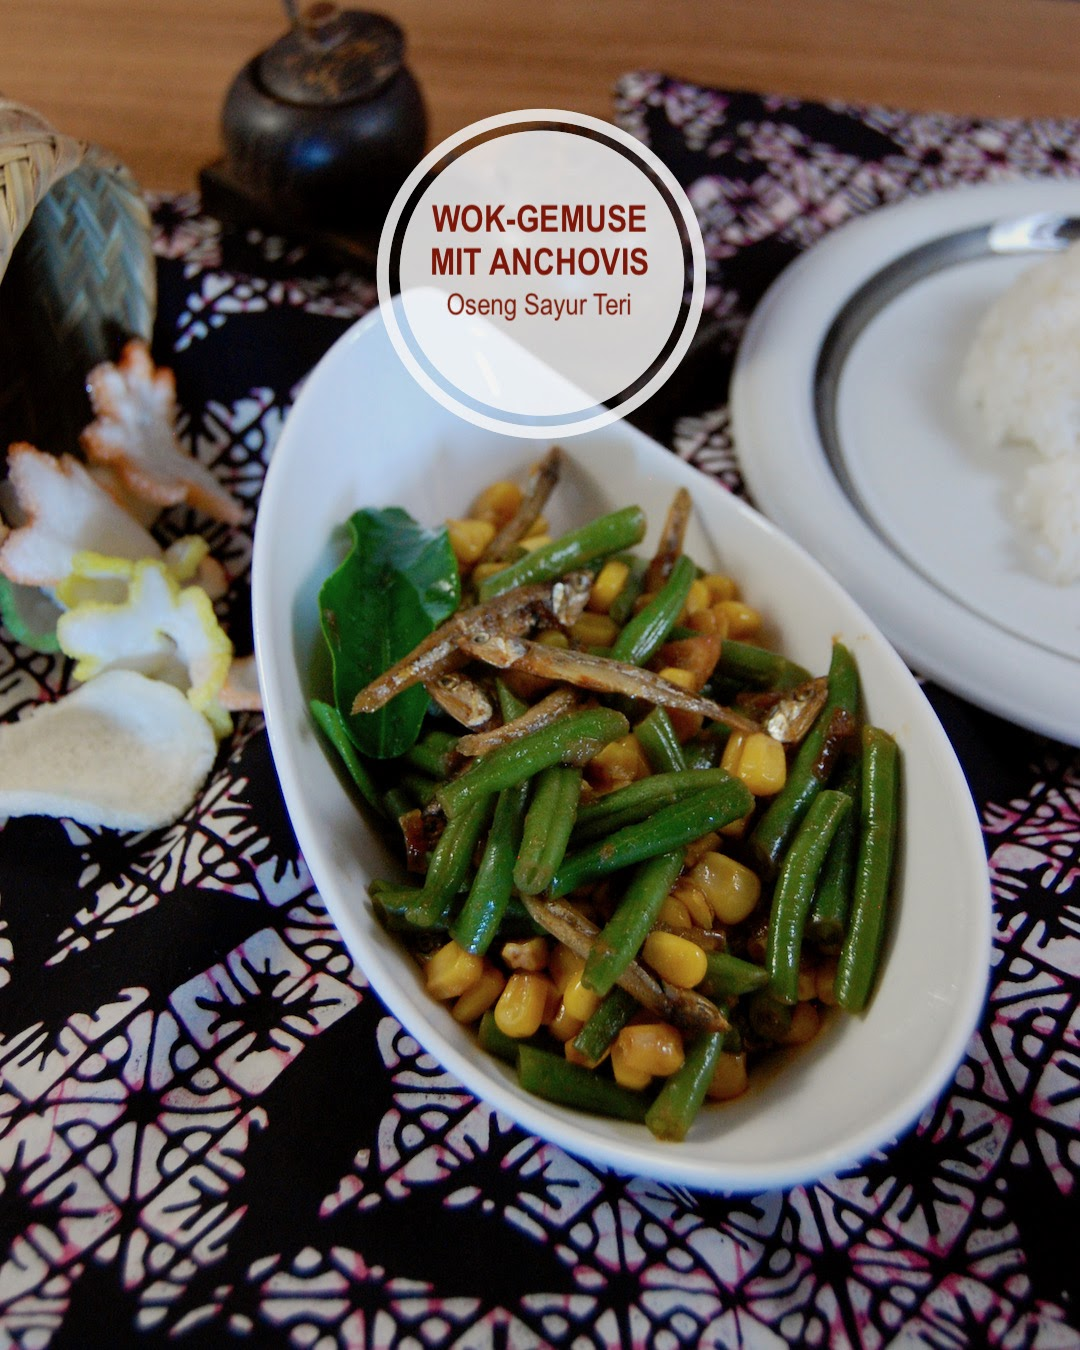 Rezept Wok-Gemüse mit Anchovis (Oseng Sayur Teri)